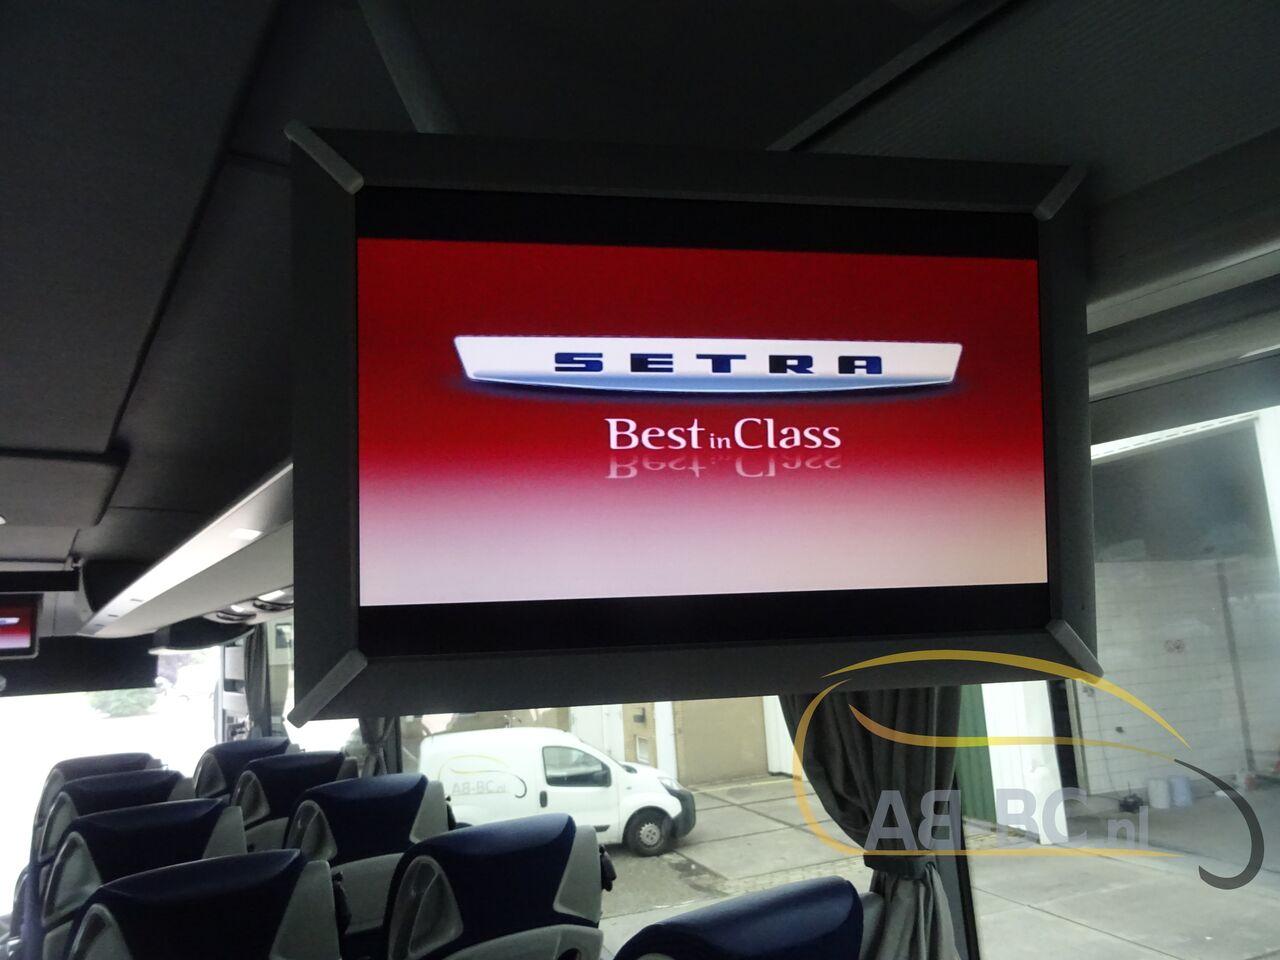 coach-busSETRA-S415-GT-HD-FINAL-EDITION---1627457216941701822_big_0bf5f1a9ad50617d00911bb6a9198f50--21050713010665719300